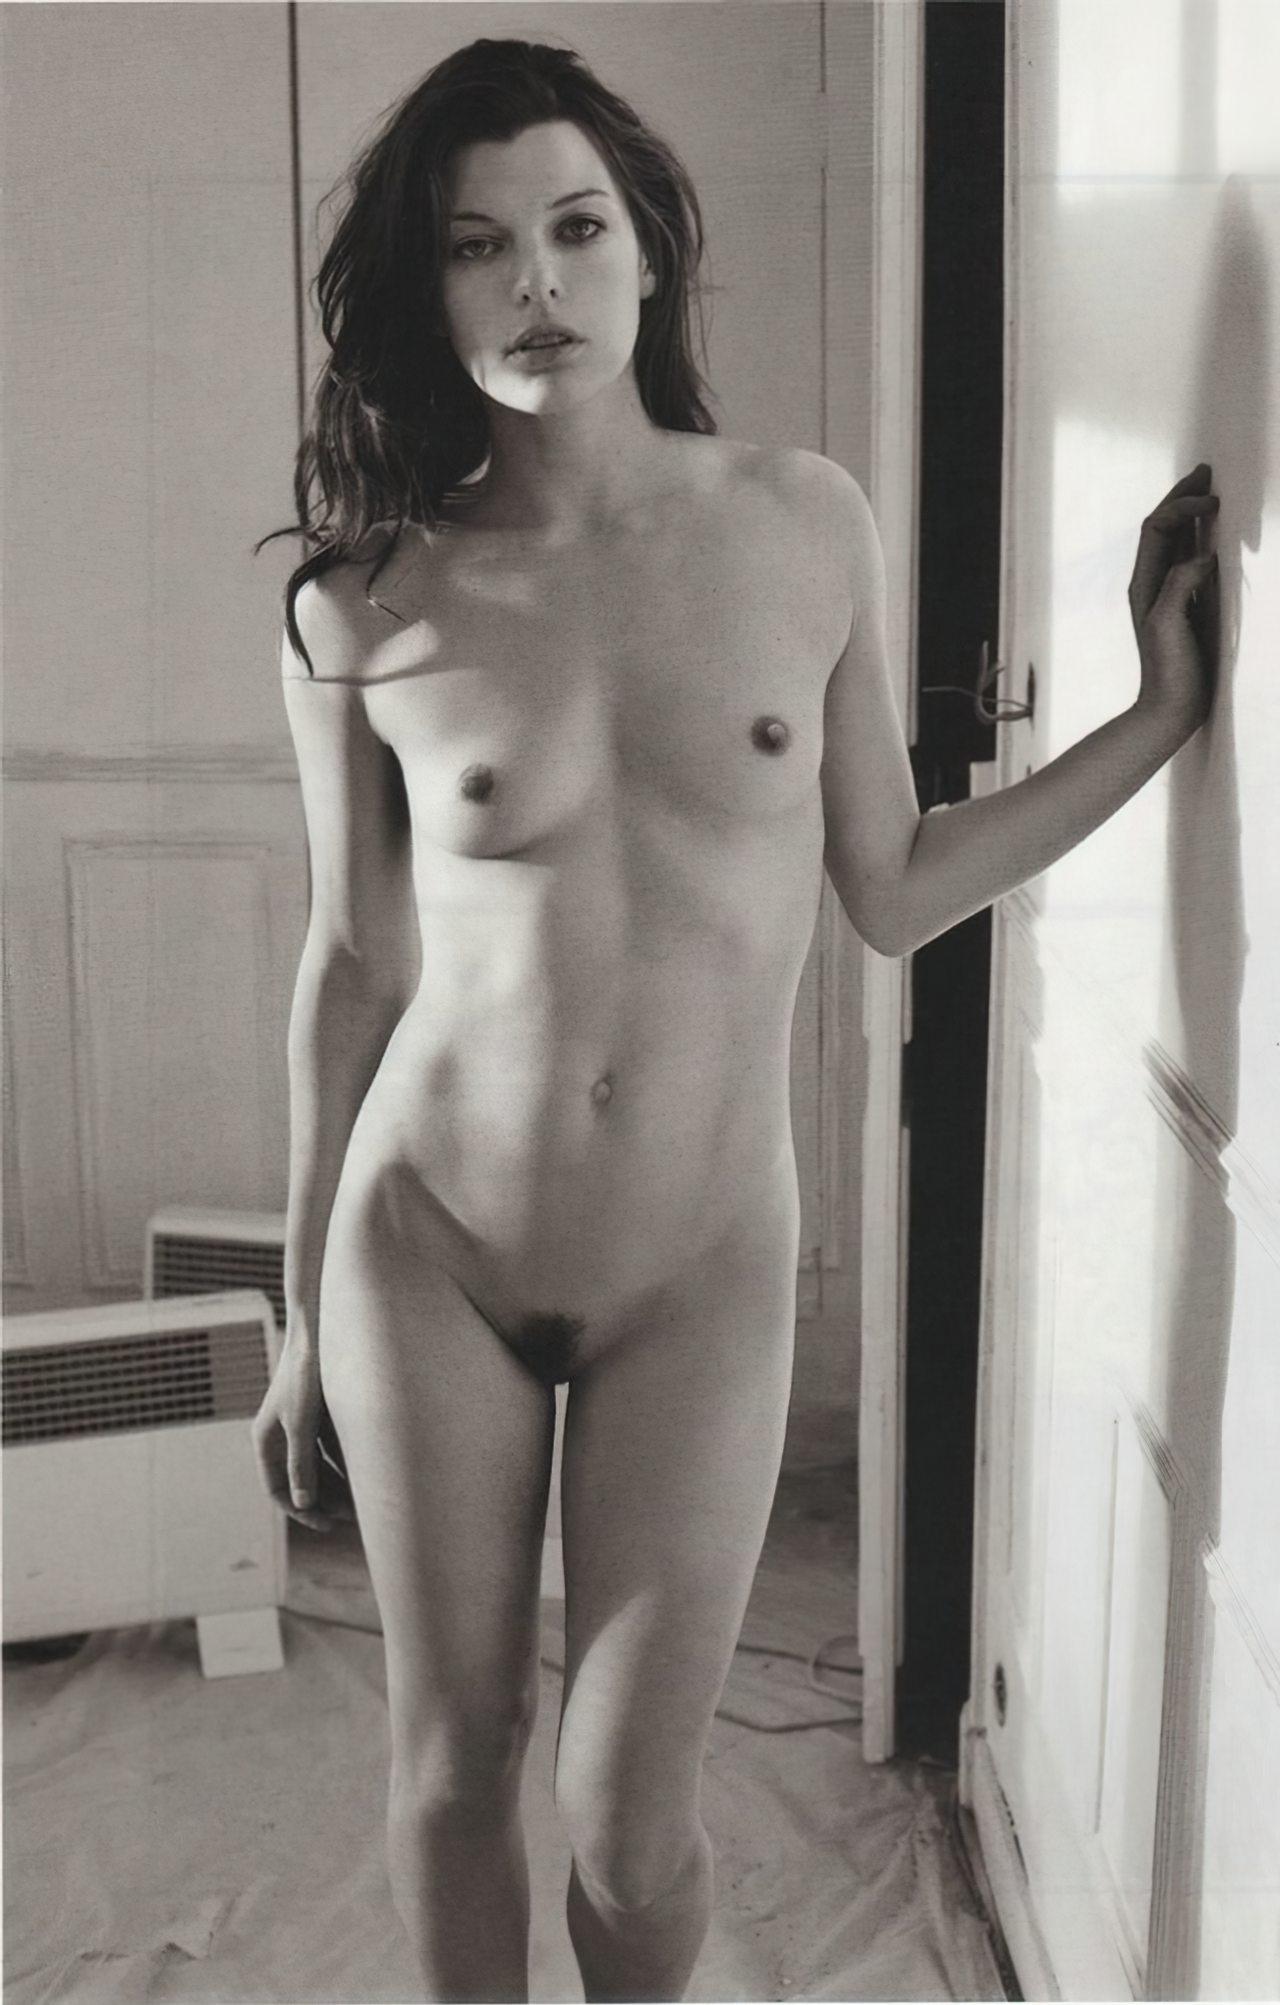 Fotos de Mulheres (12)